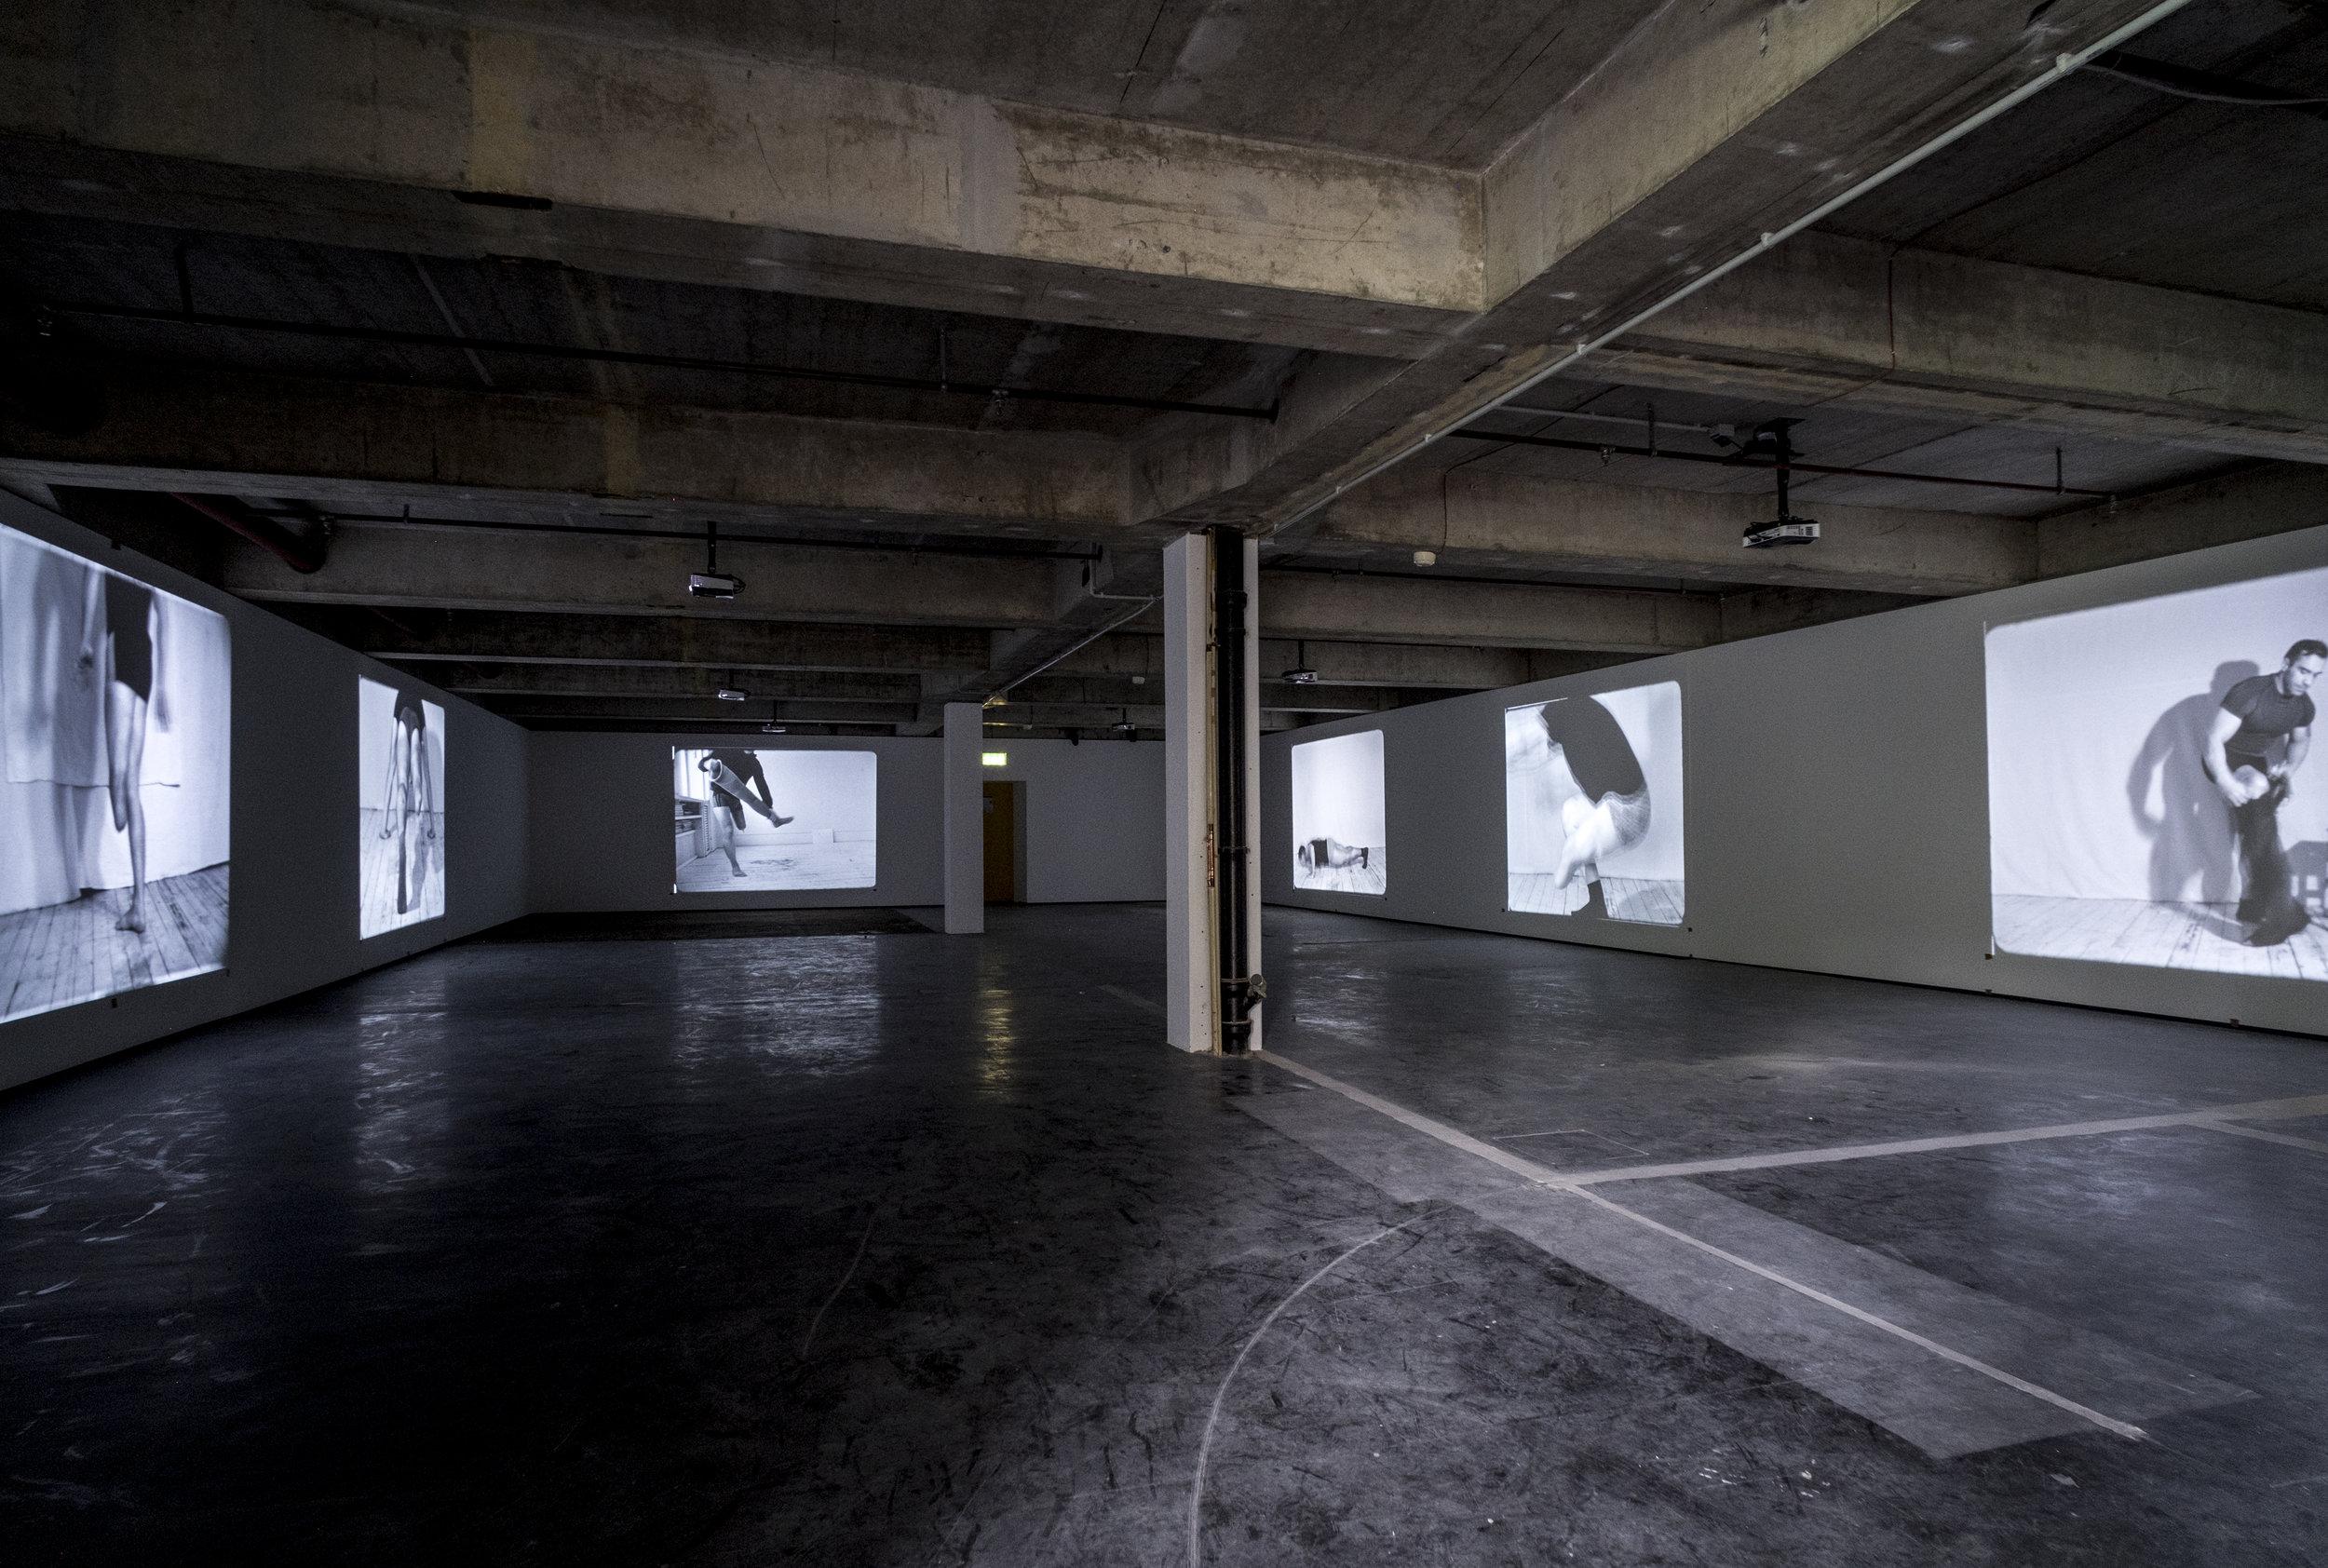 Artur Żmijewski, Realism , 2017, six channel video, Installation, Neue Neue Galerie (Neue Hauptpost), Kassel, documenta 14, Photo: Mathias Völzke